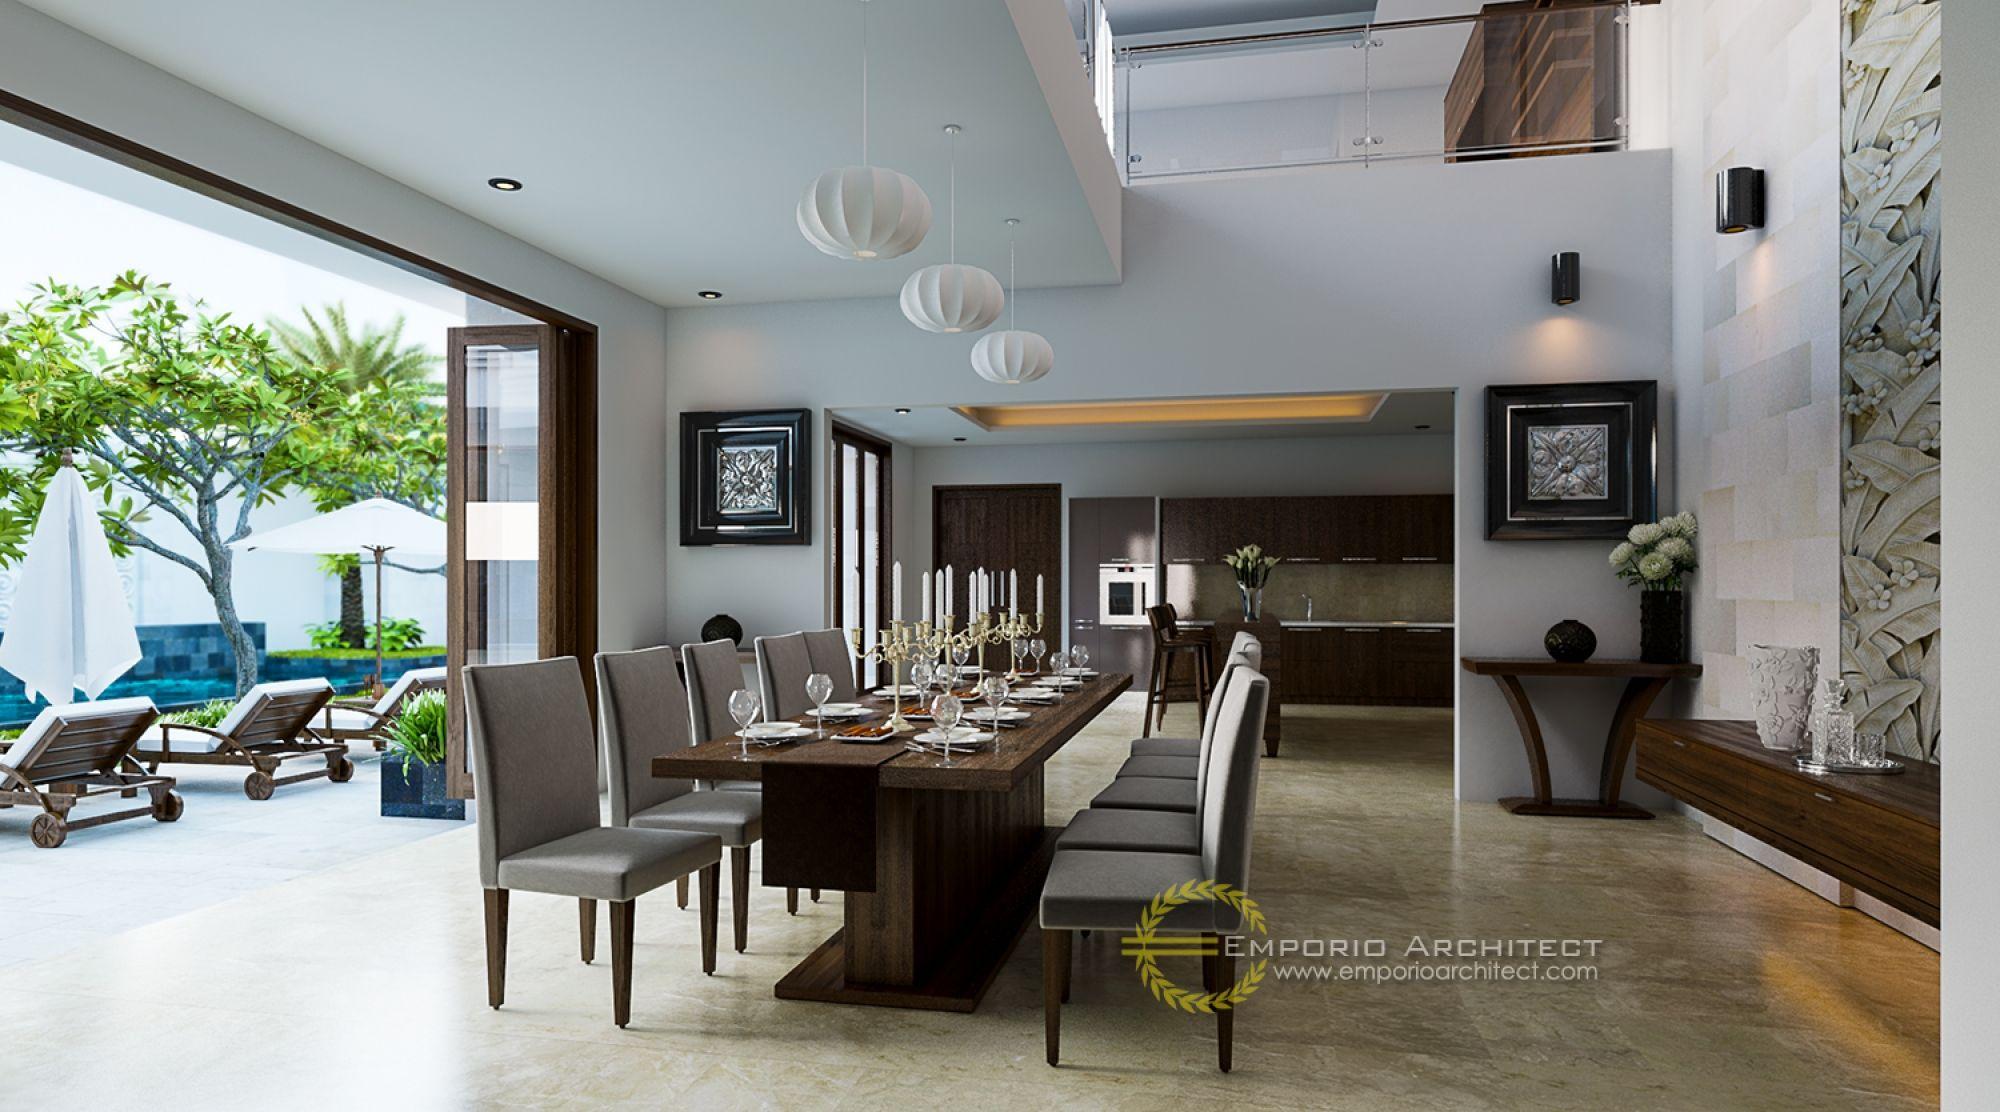 Jasa Arsitek Jakarta Desain Rumah Bapak Martinus casas